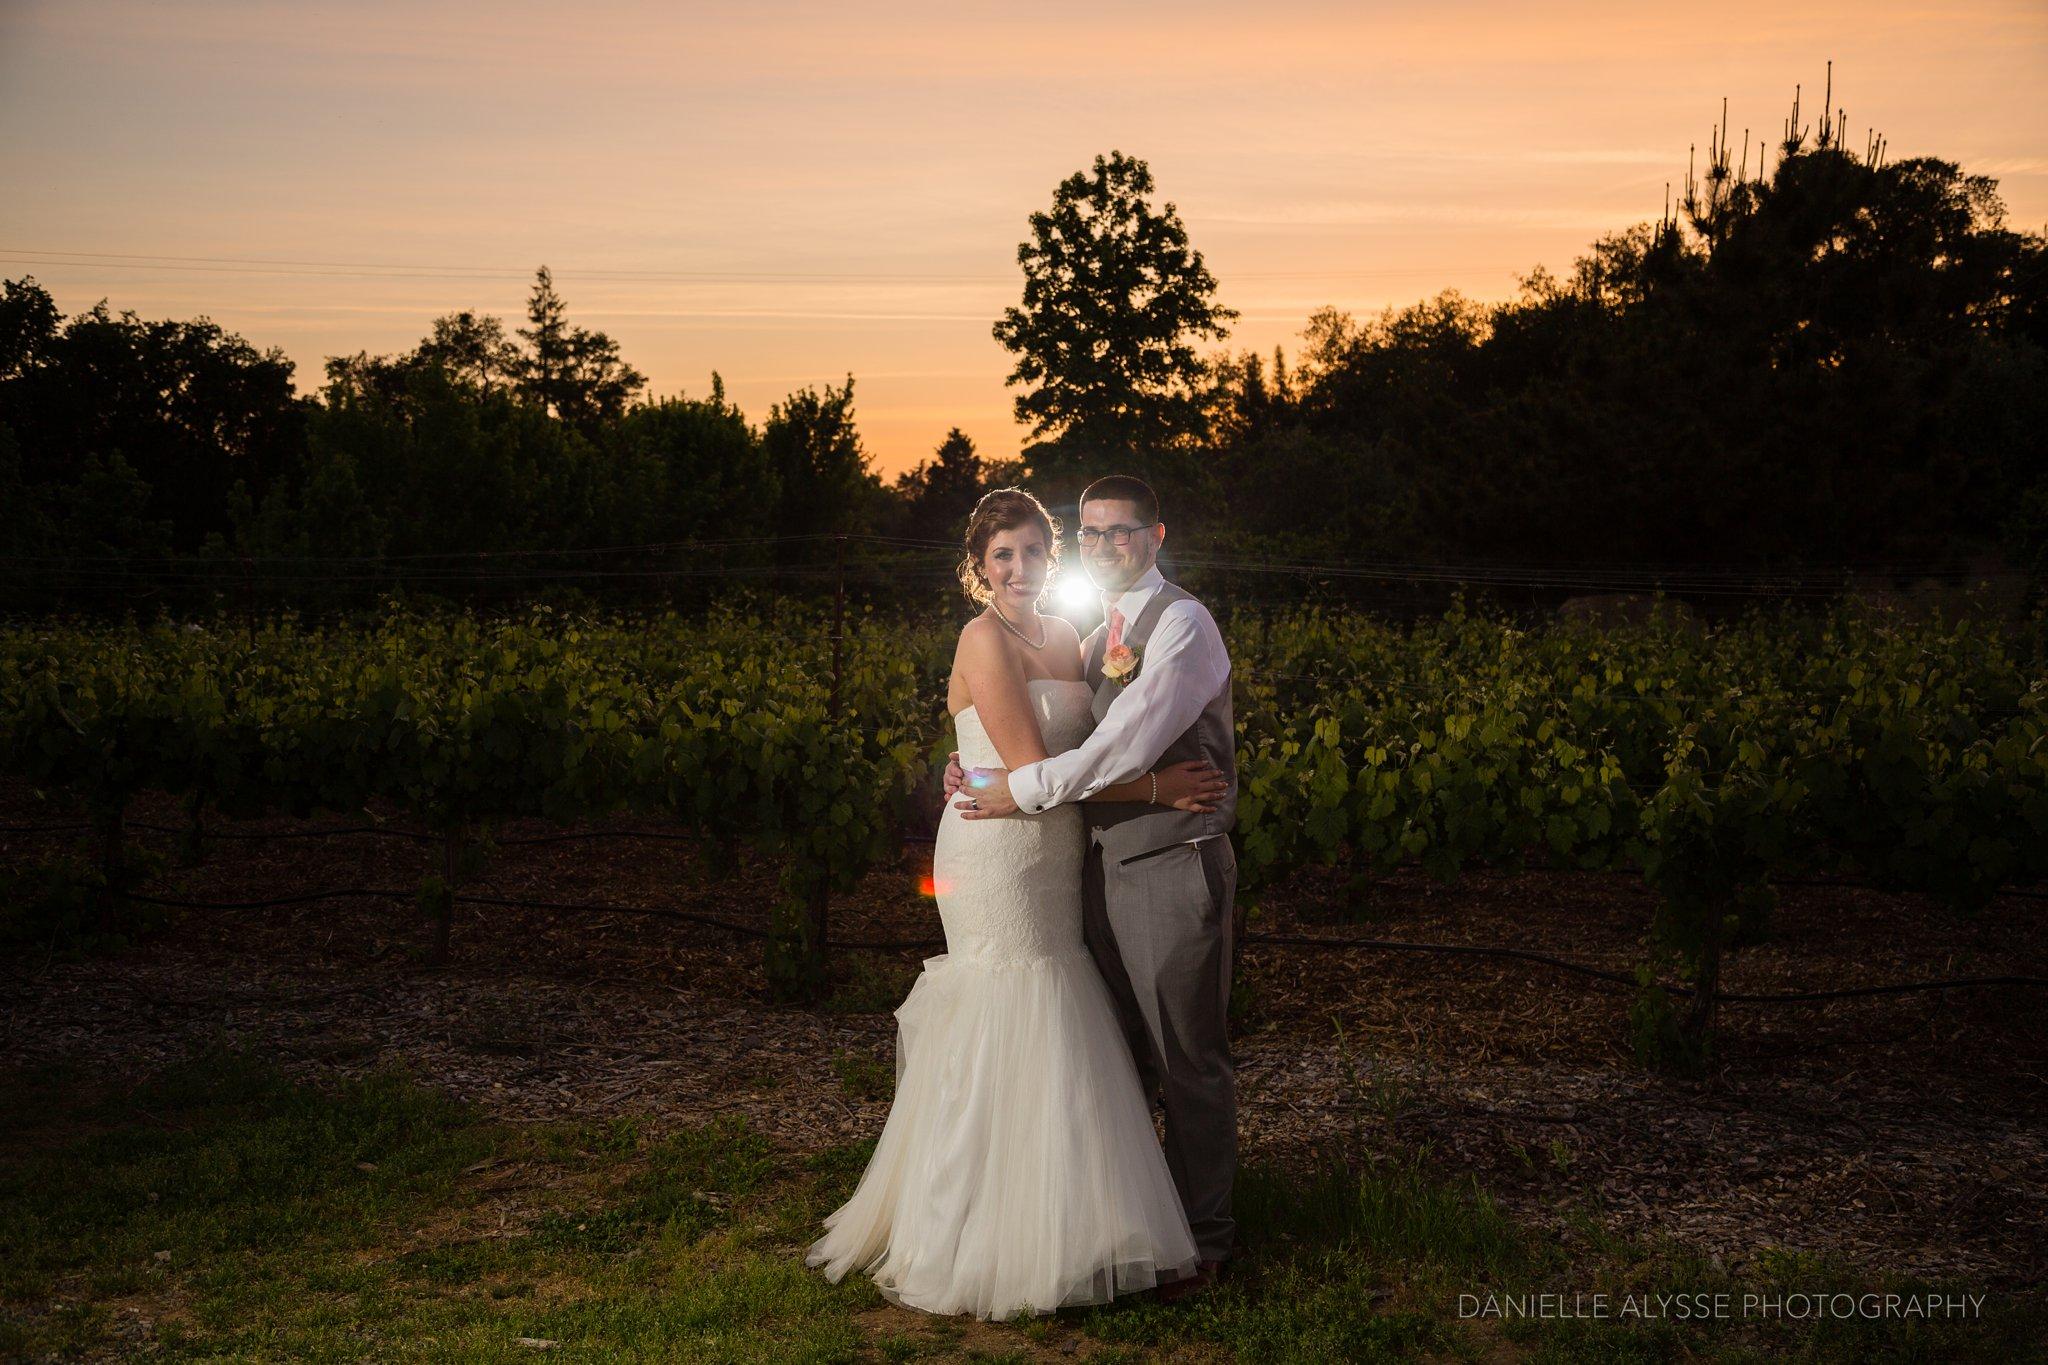 170507_blog_megan_david_wedding_loomis_flower_farm_inn_danielle_alysse_photography_sacramento_photographer0411_WEB.jpg